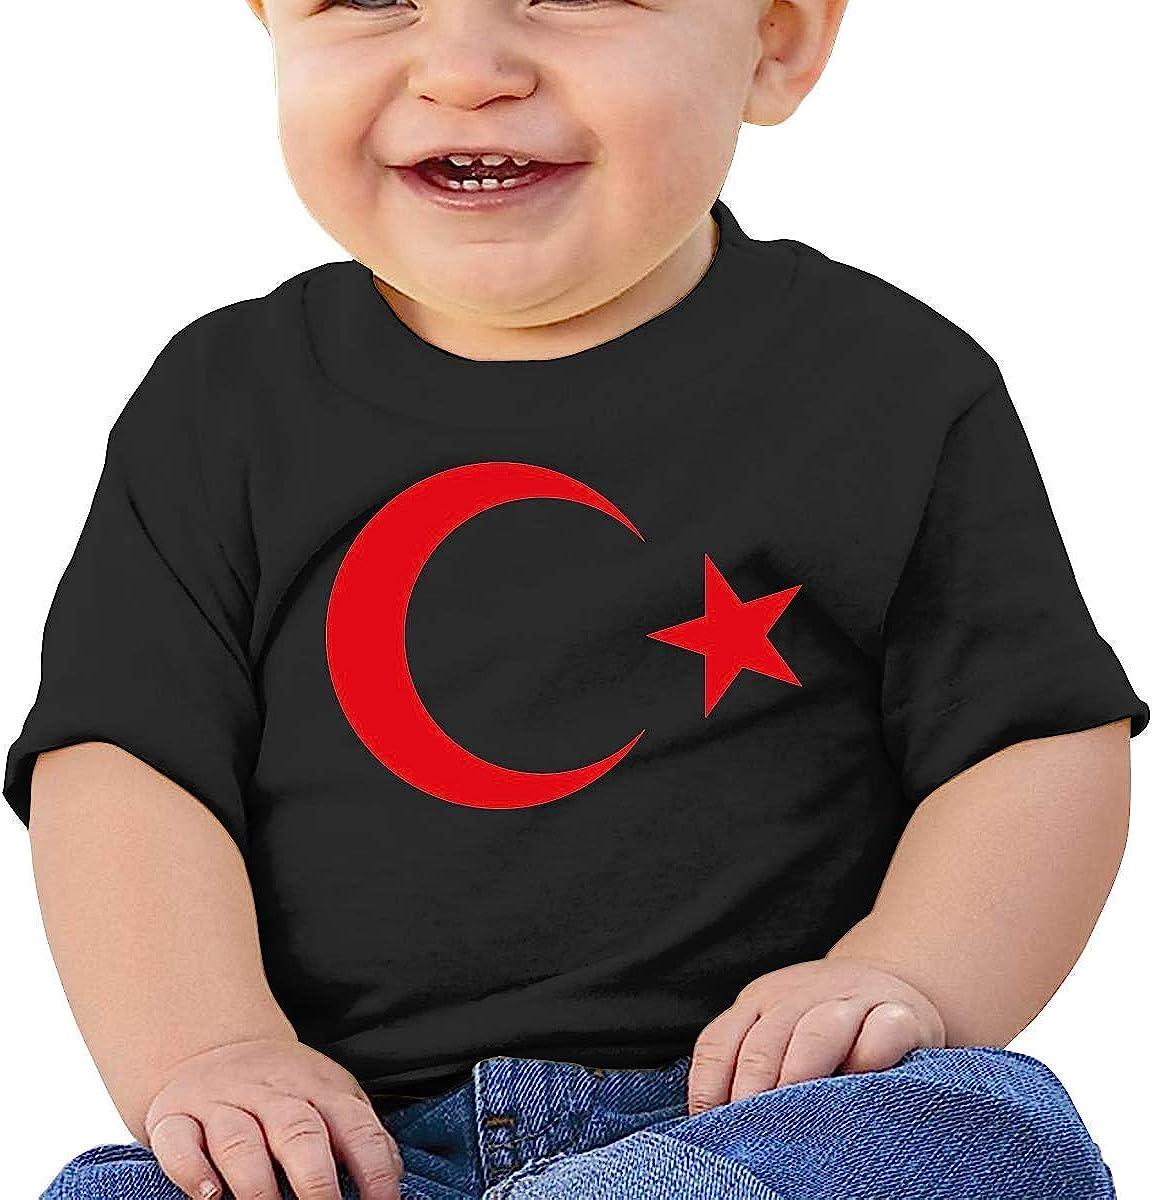 Turkish Emblem Baby Short Sleeve T Shirt 100/% Organic Cotton Cute Baby Top